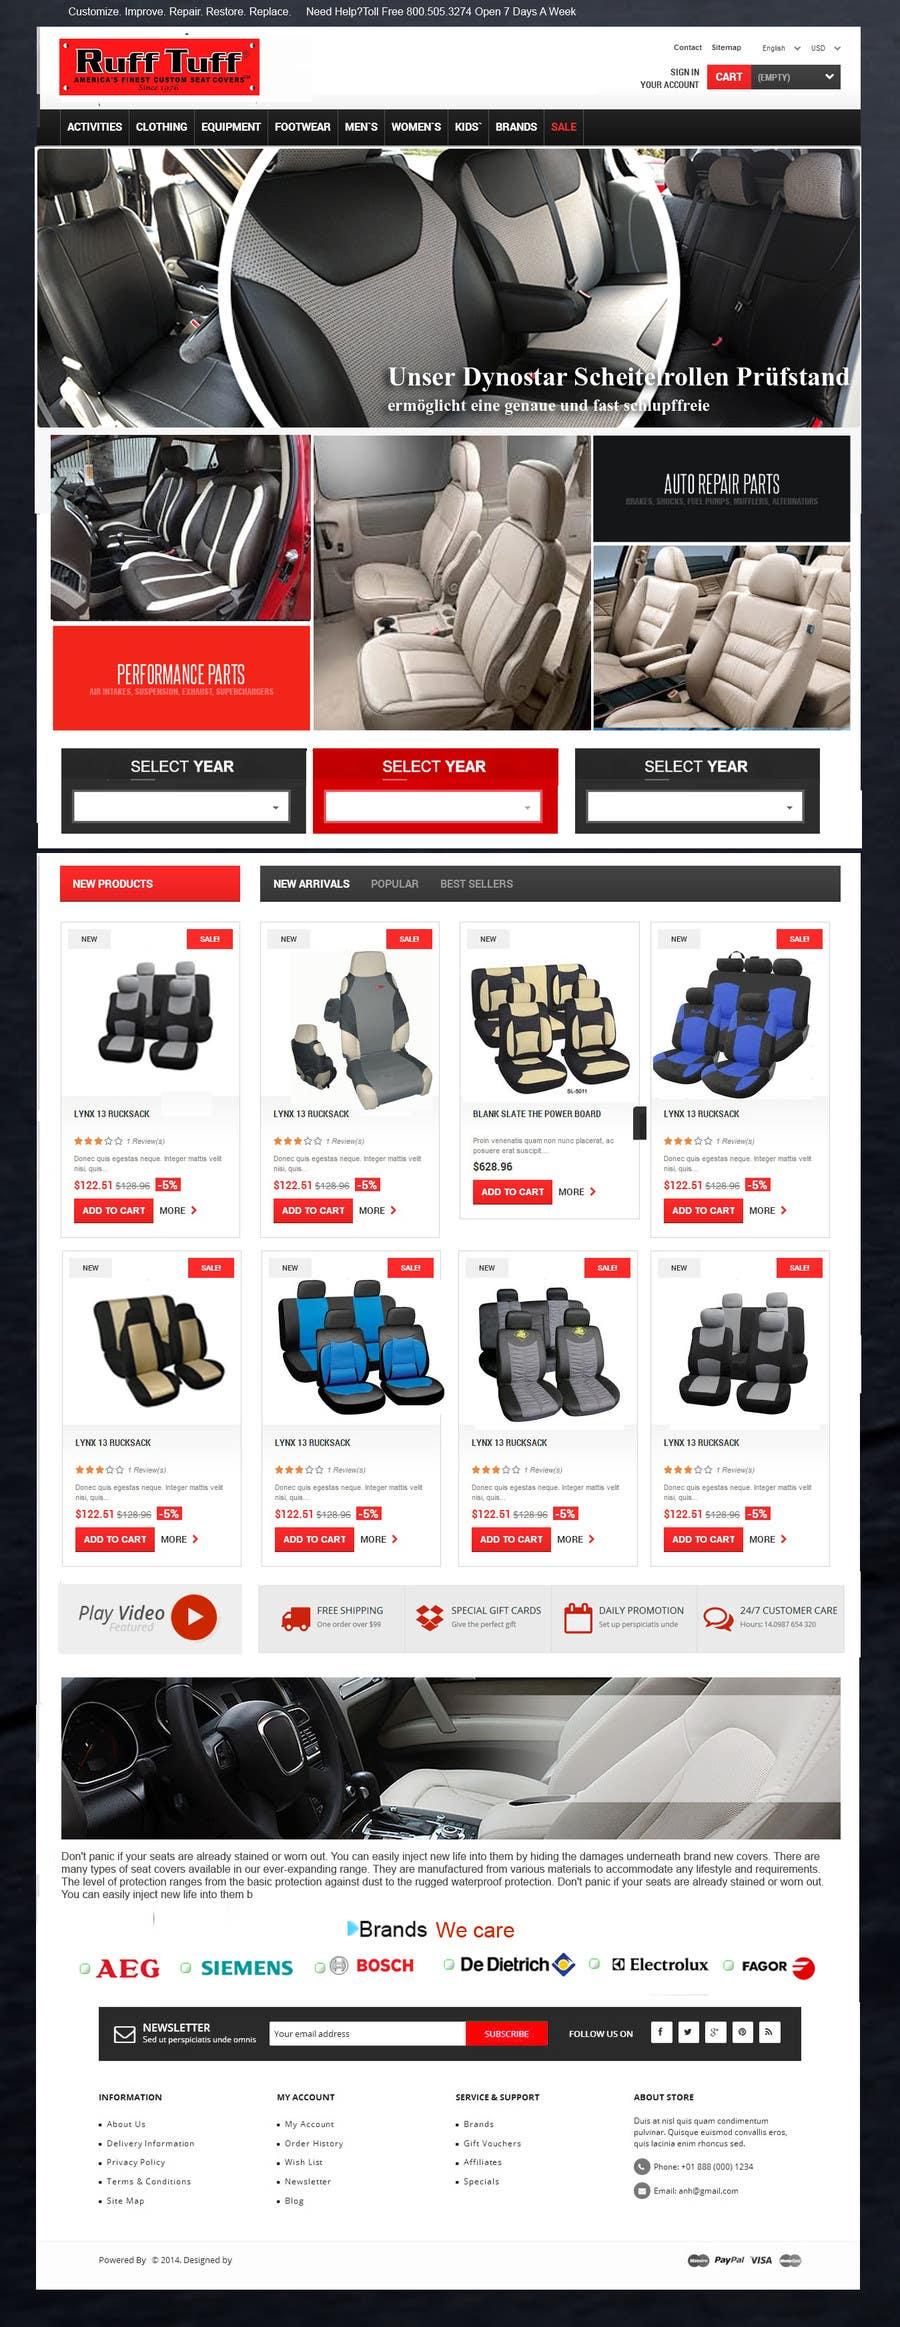 Penyertaan Peraduan #                                        22                                      untuk                                         Design a Website Mockup for an auto seat cover manufacturer